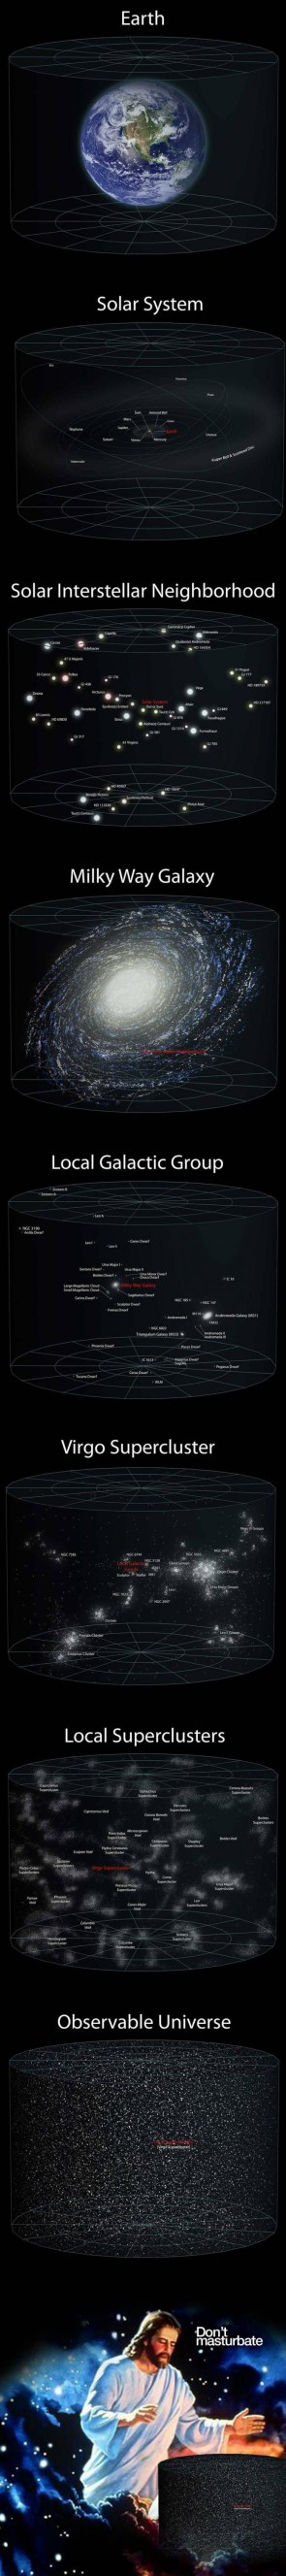 the religious universe